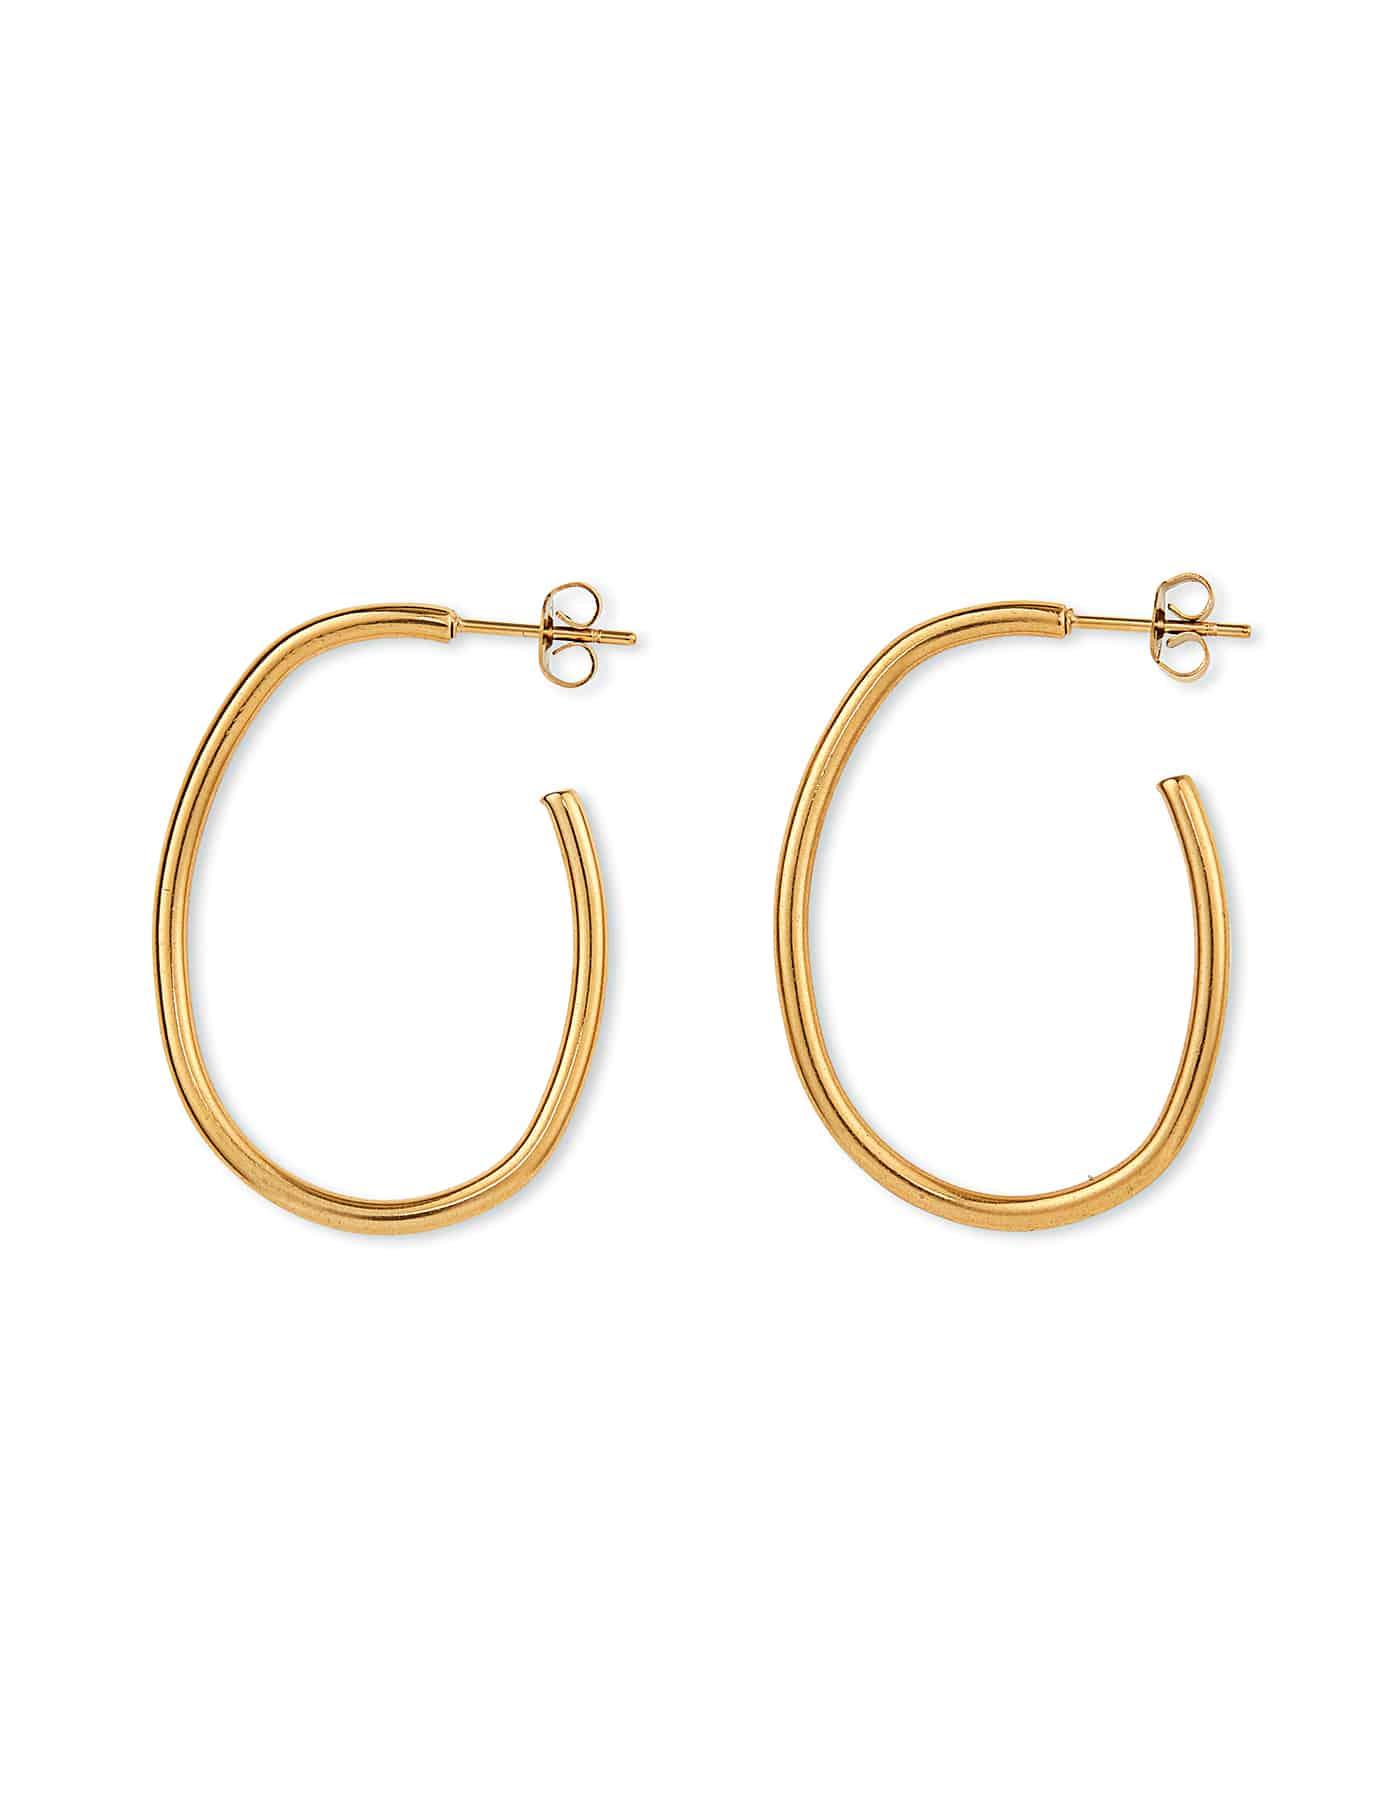 Gold Oval Hoop Earrings, Forever Lasting